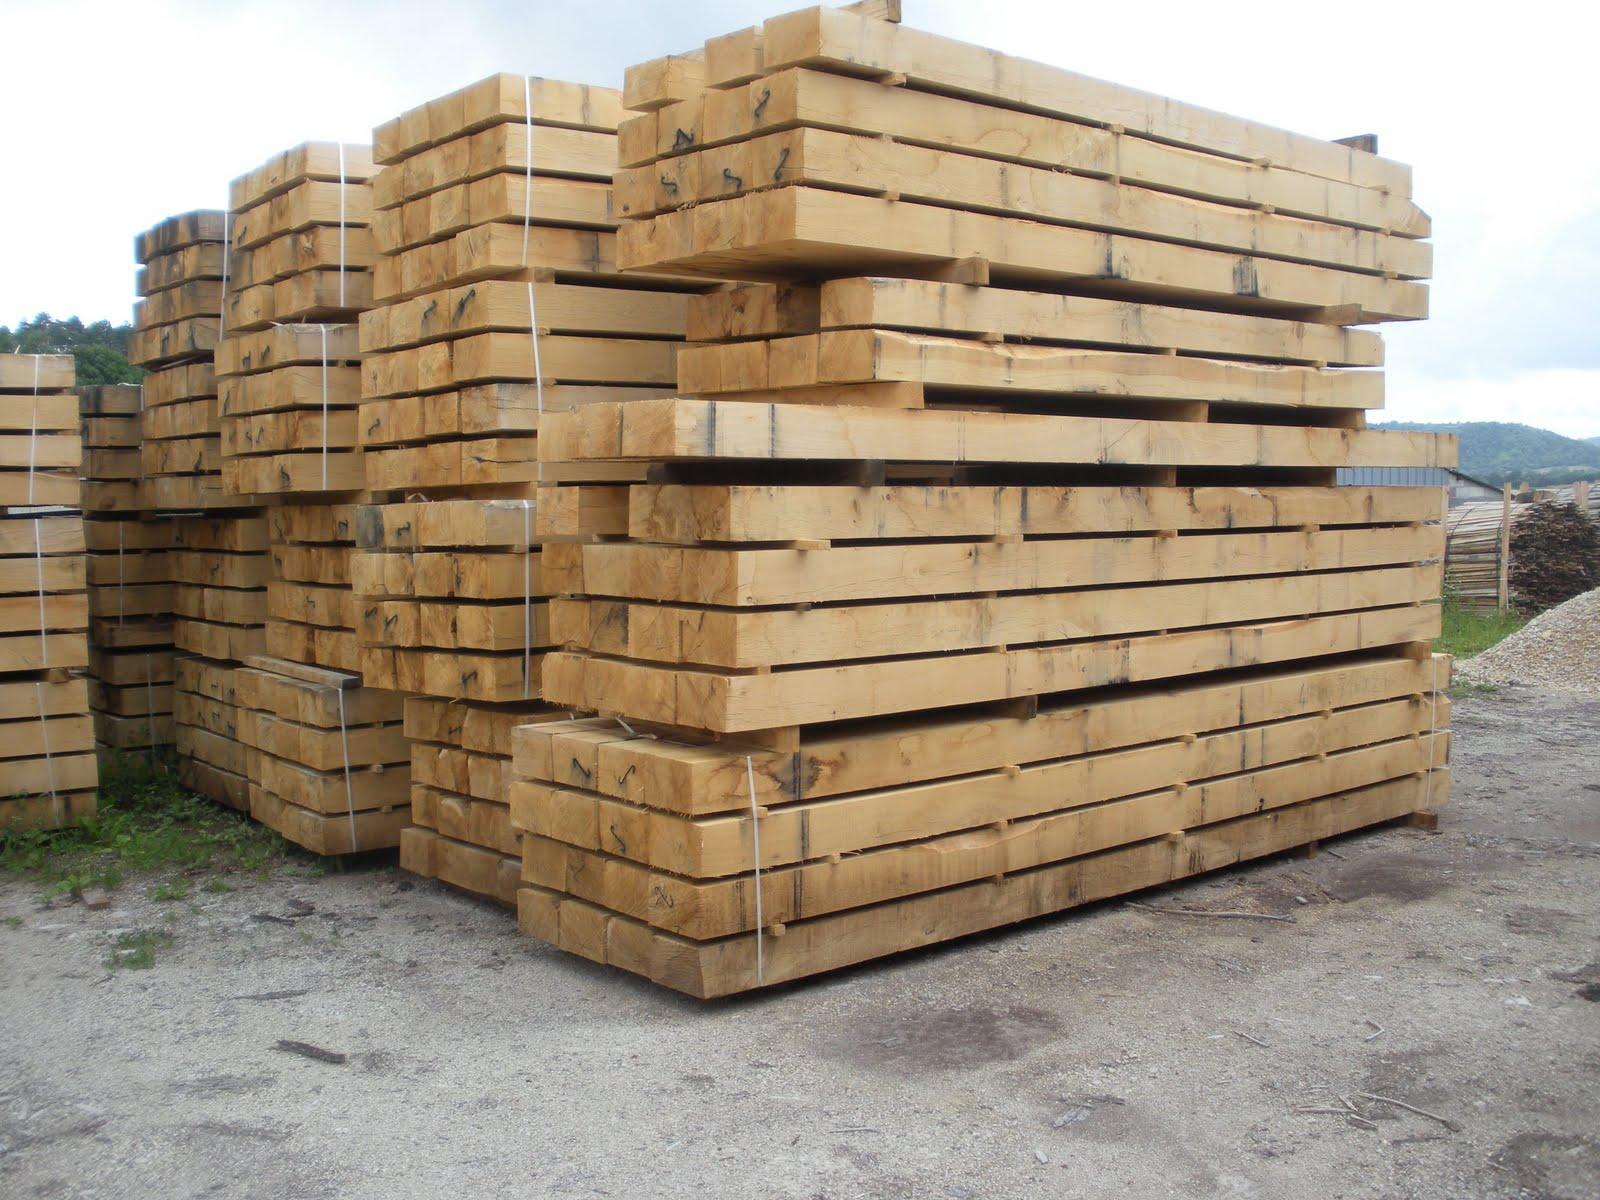 Traviesas de roble maderas garc a varona - Traviesas de madera ...